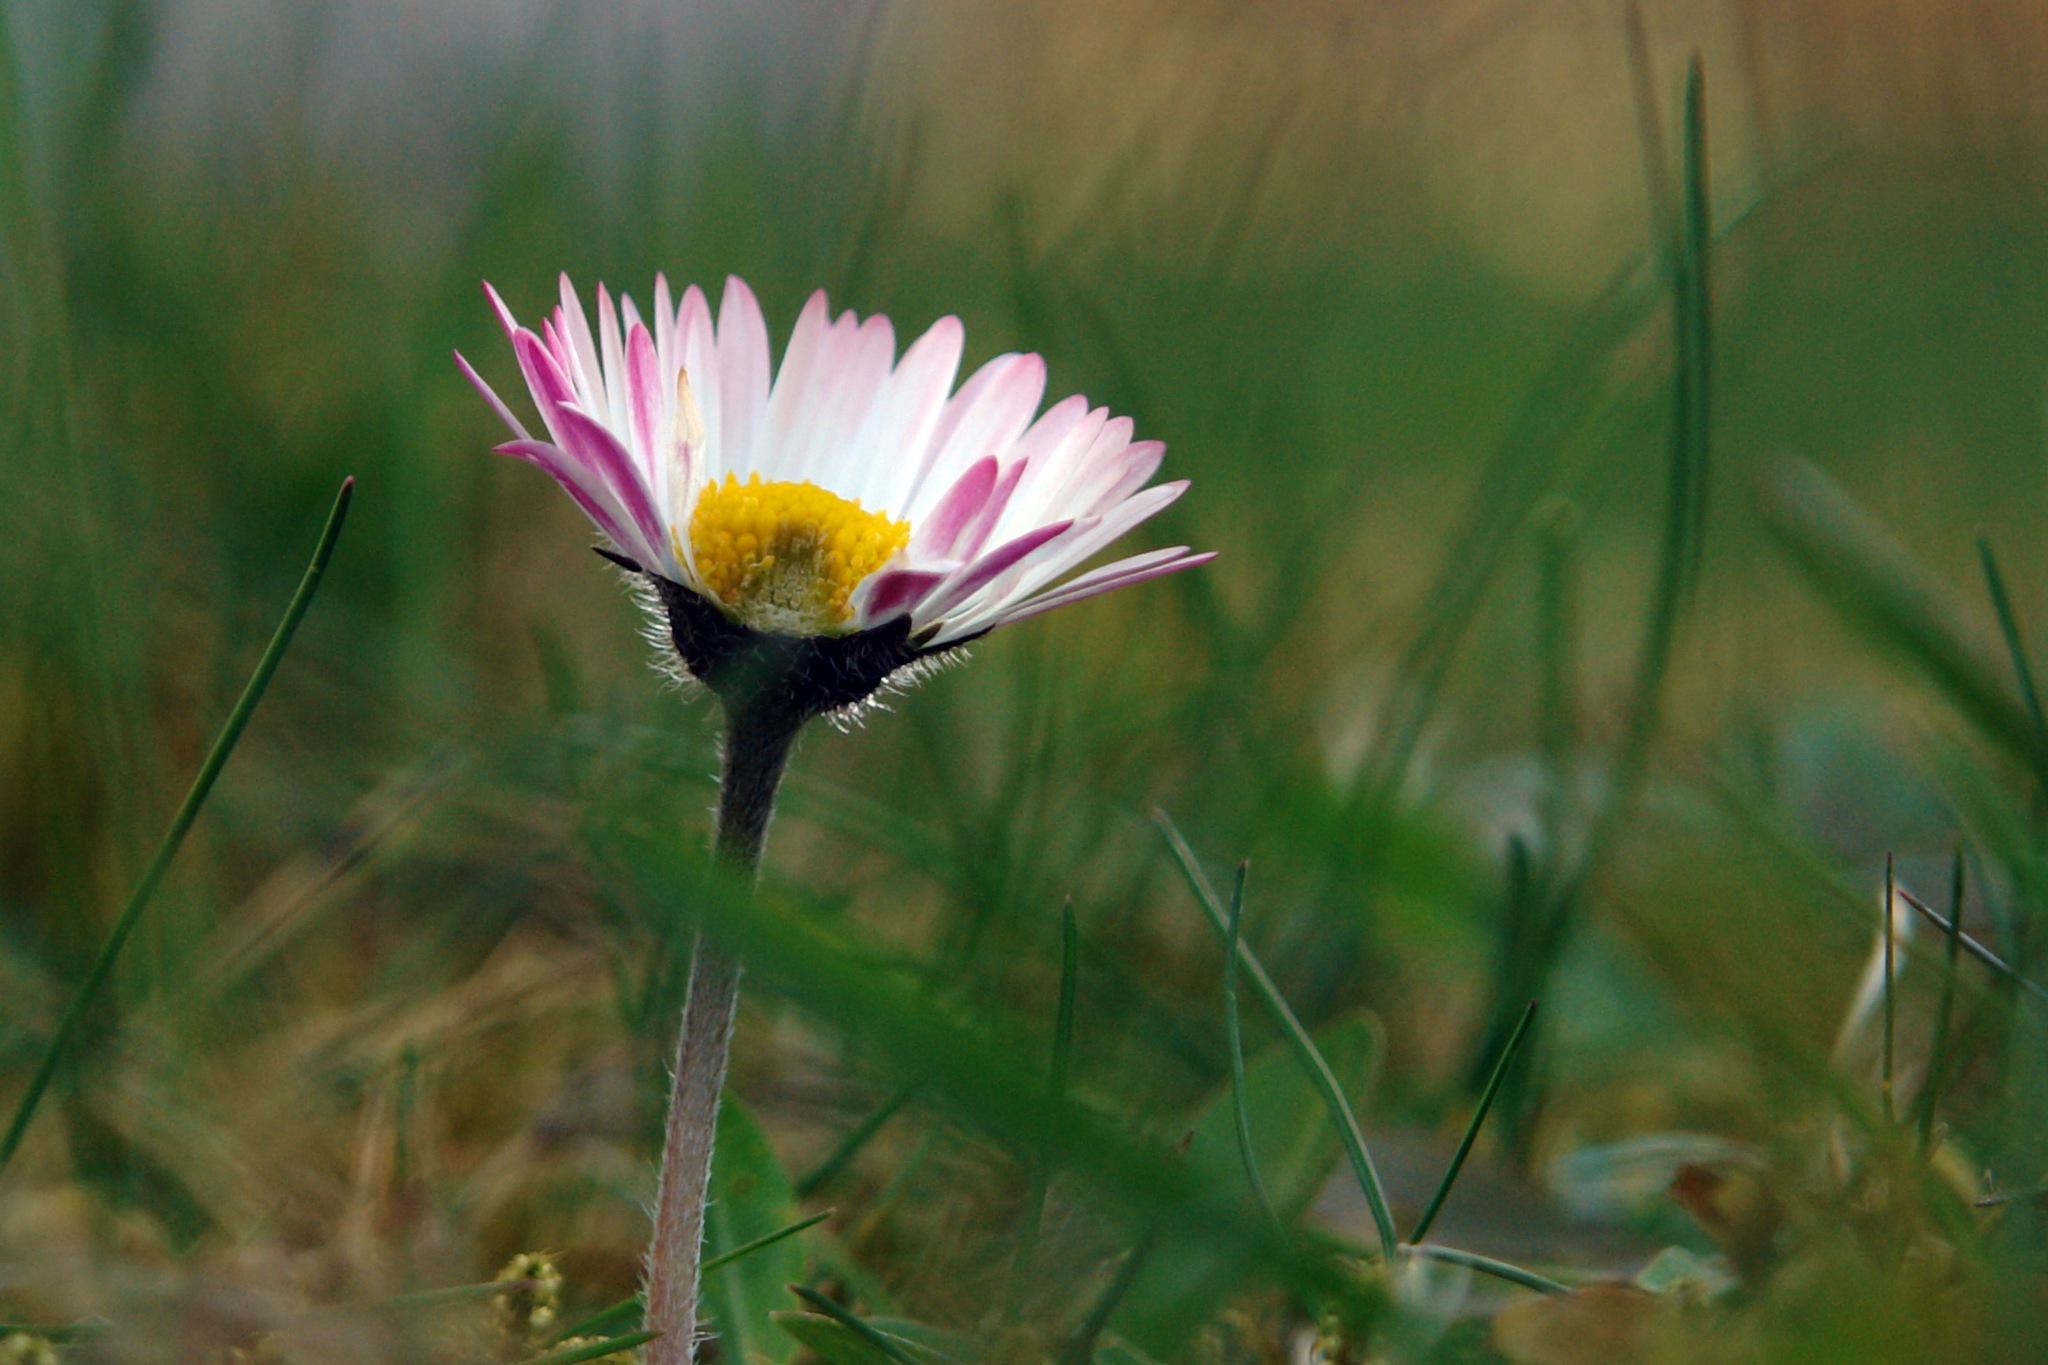 Frühling im Garten 2 by gordana1000